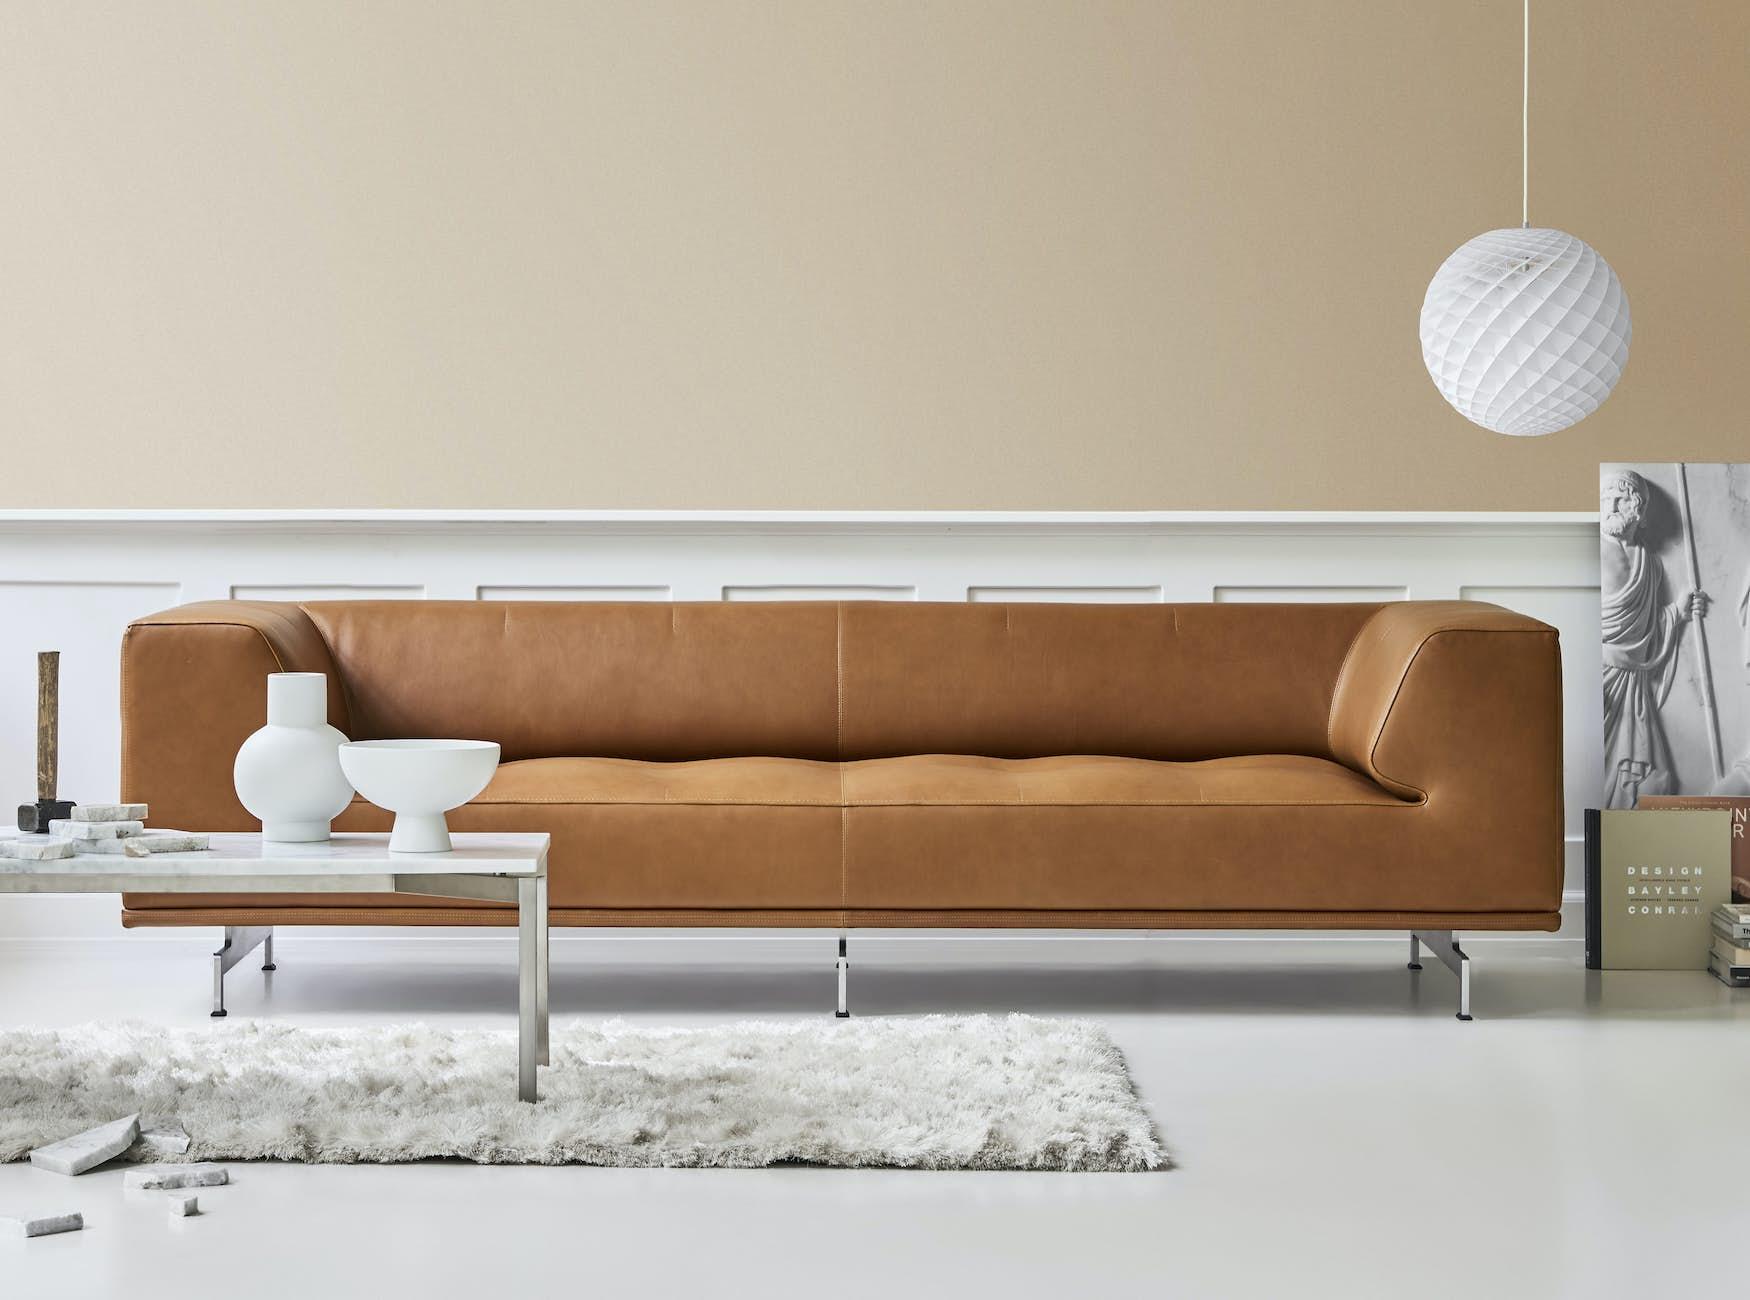 Tilbud på Delphi sofaen